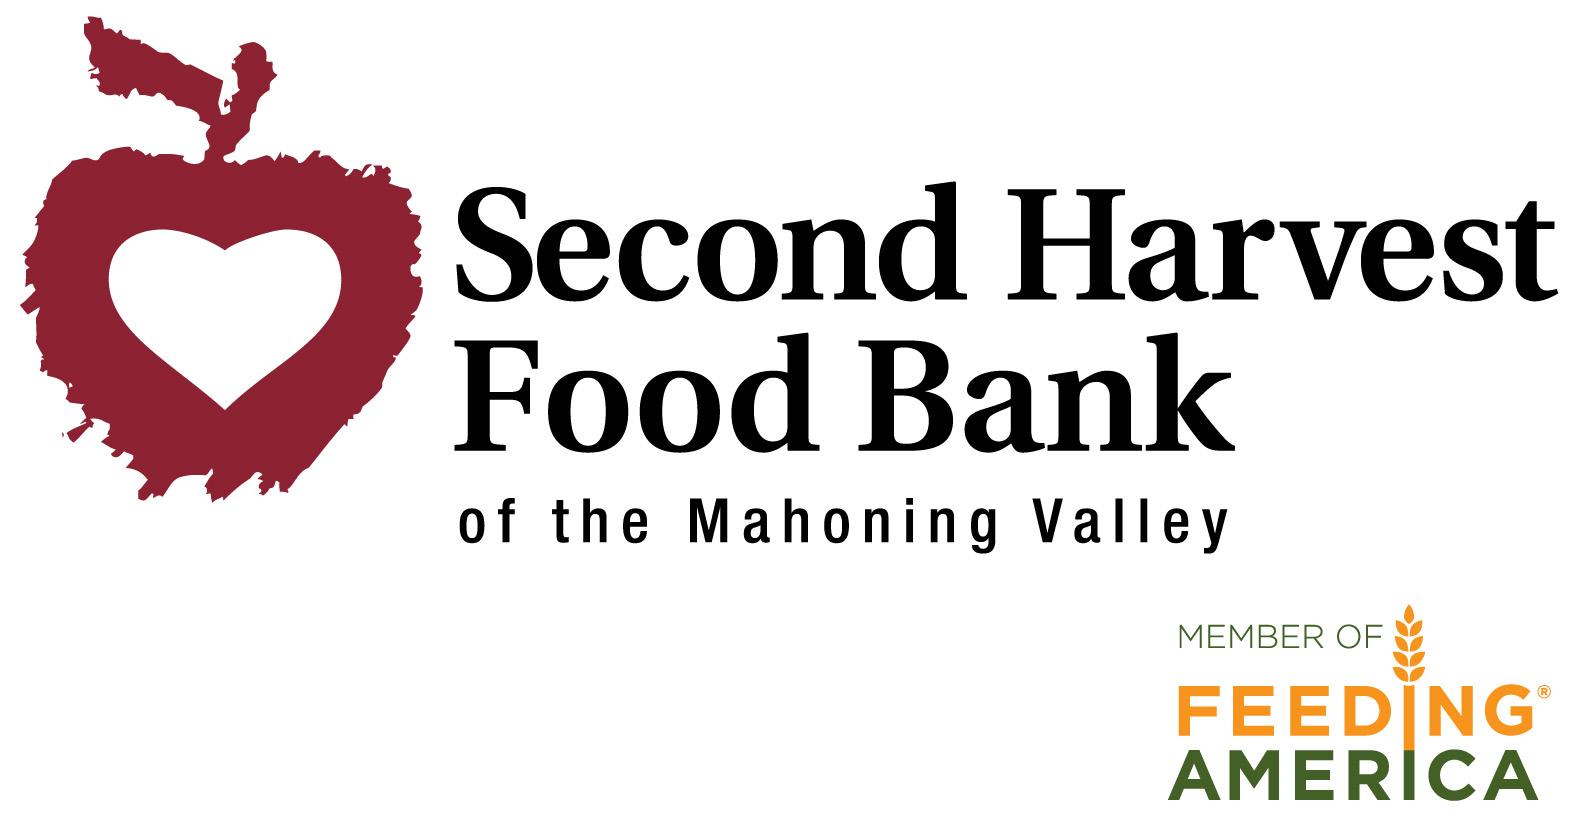 SHFB-0224-second-harvest-feeding-america logo